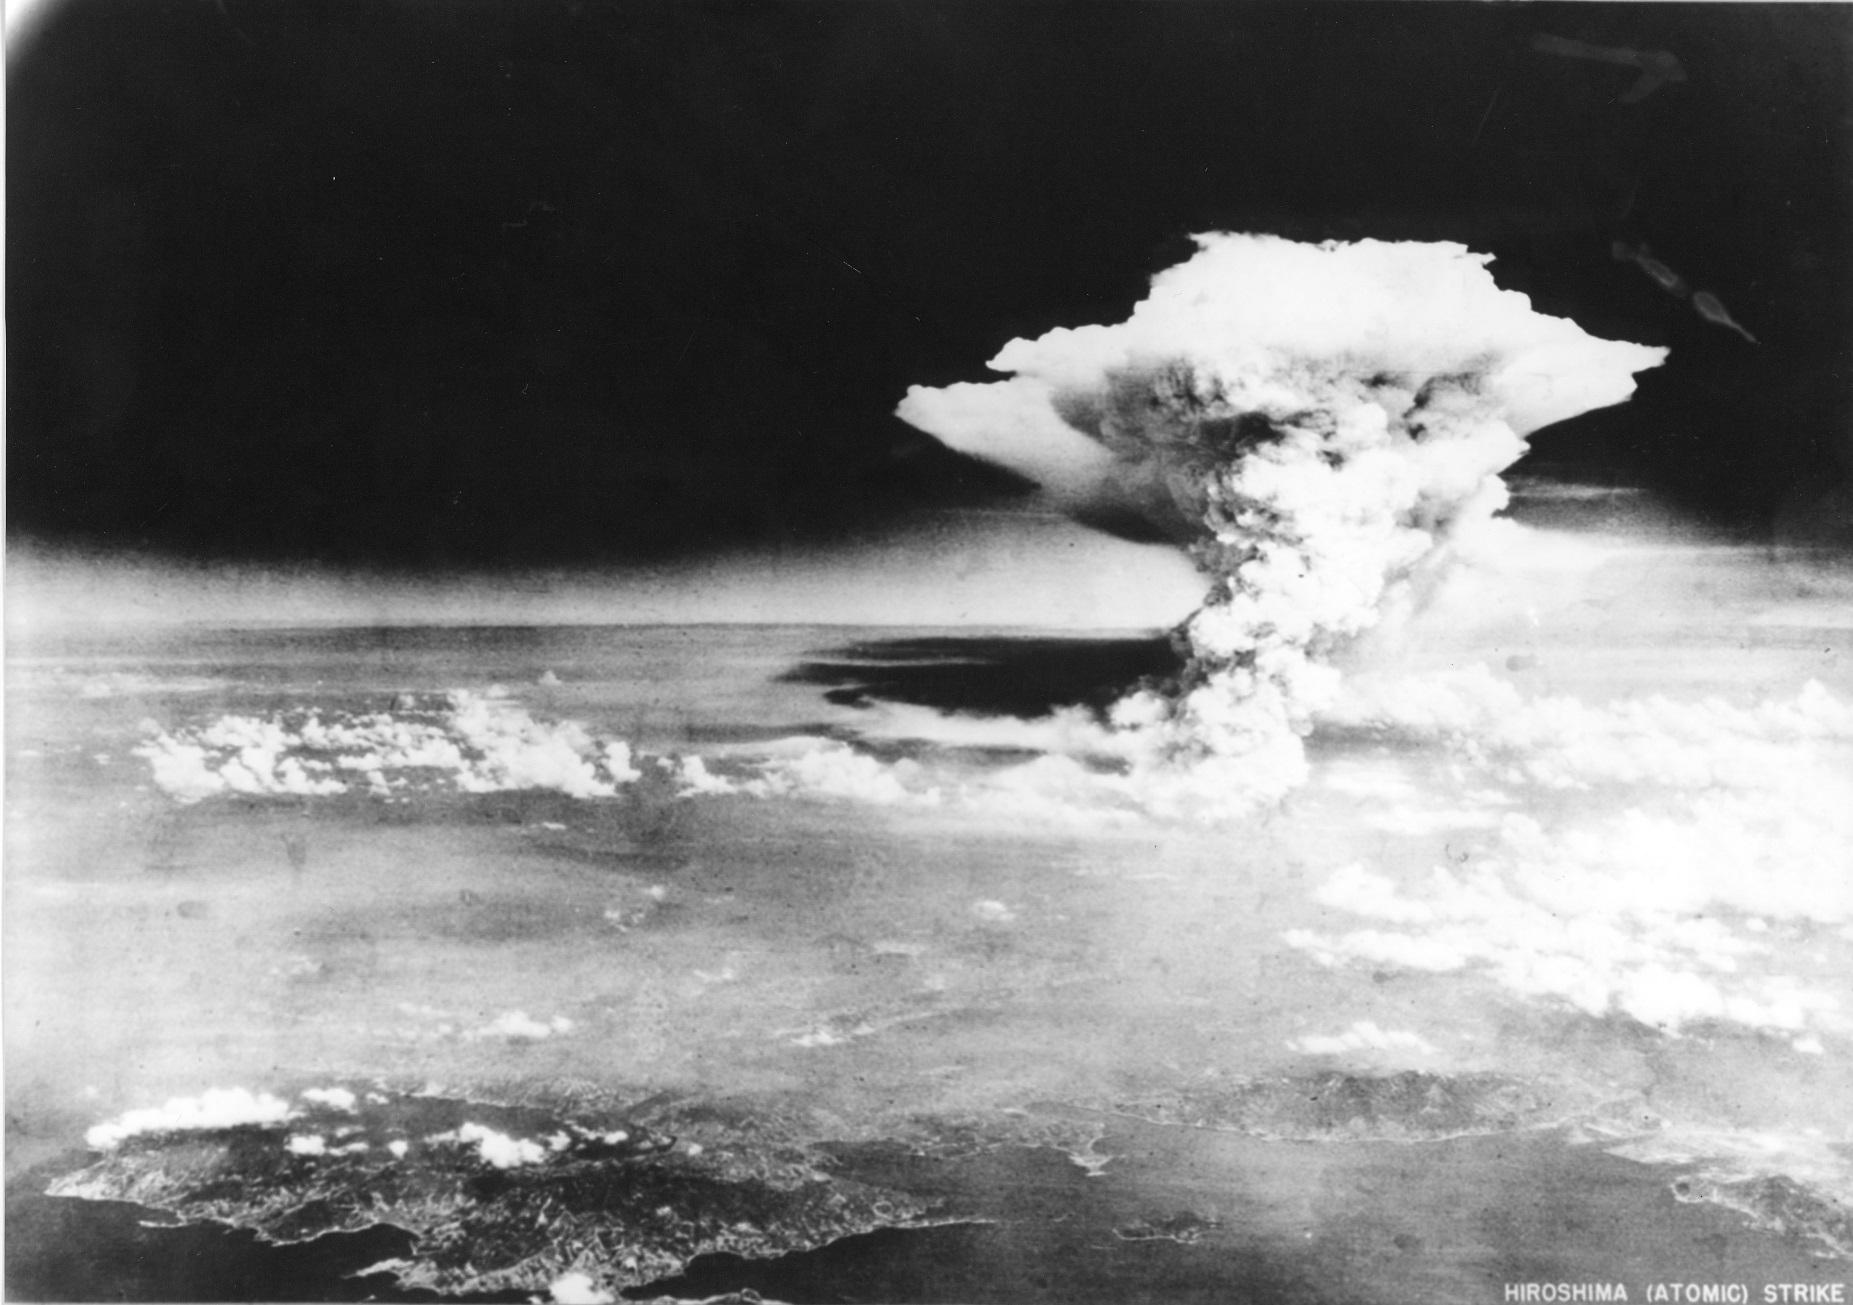 (Foto: Handout / Hiroshima Peace Memorial Museum / US ARMY / AFP)